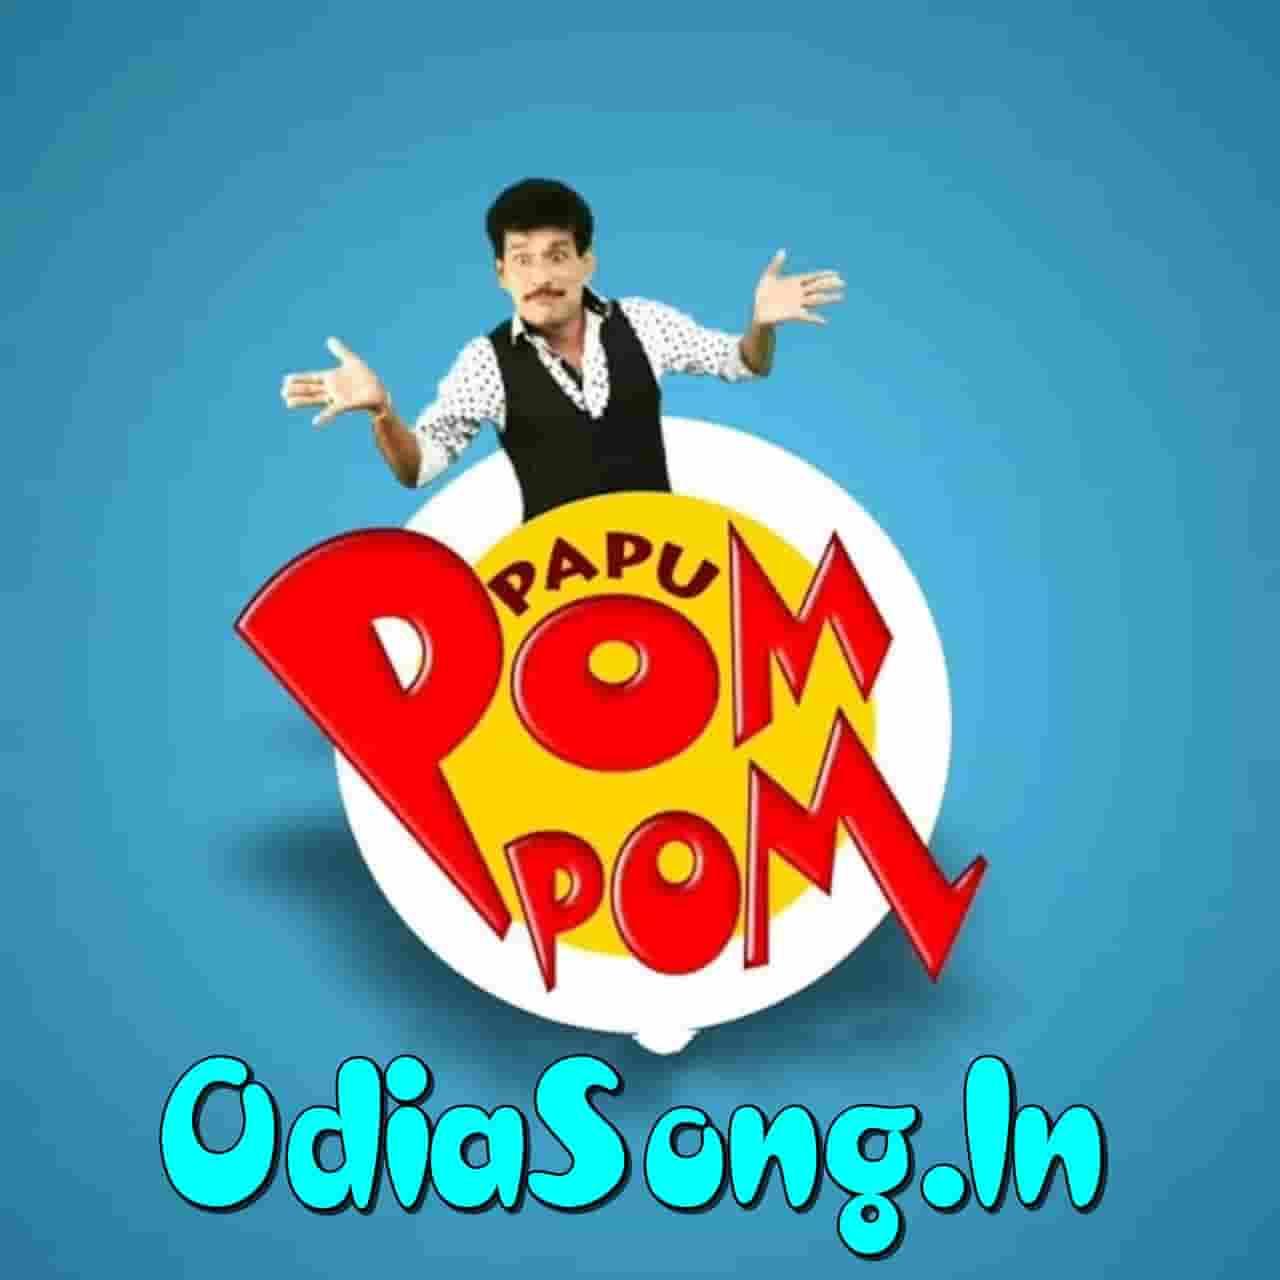 Sonu Song By Papu Pom Pom (Oriya Version)